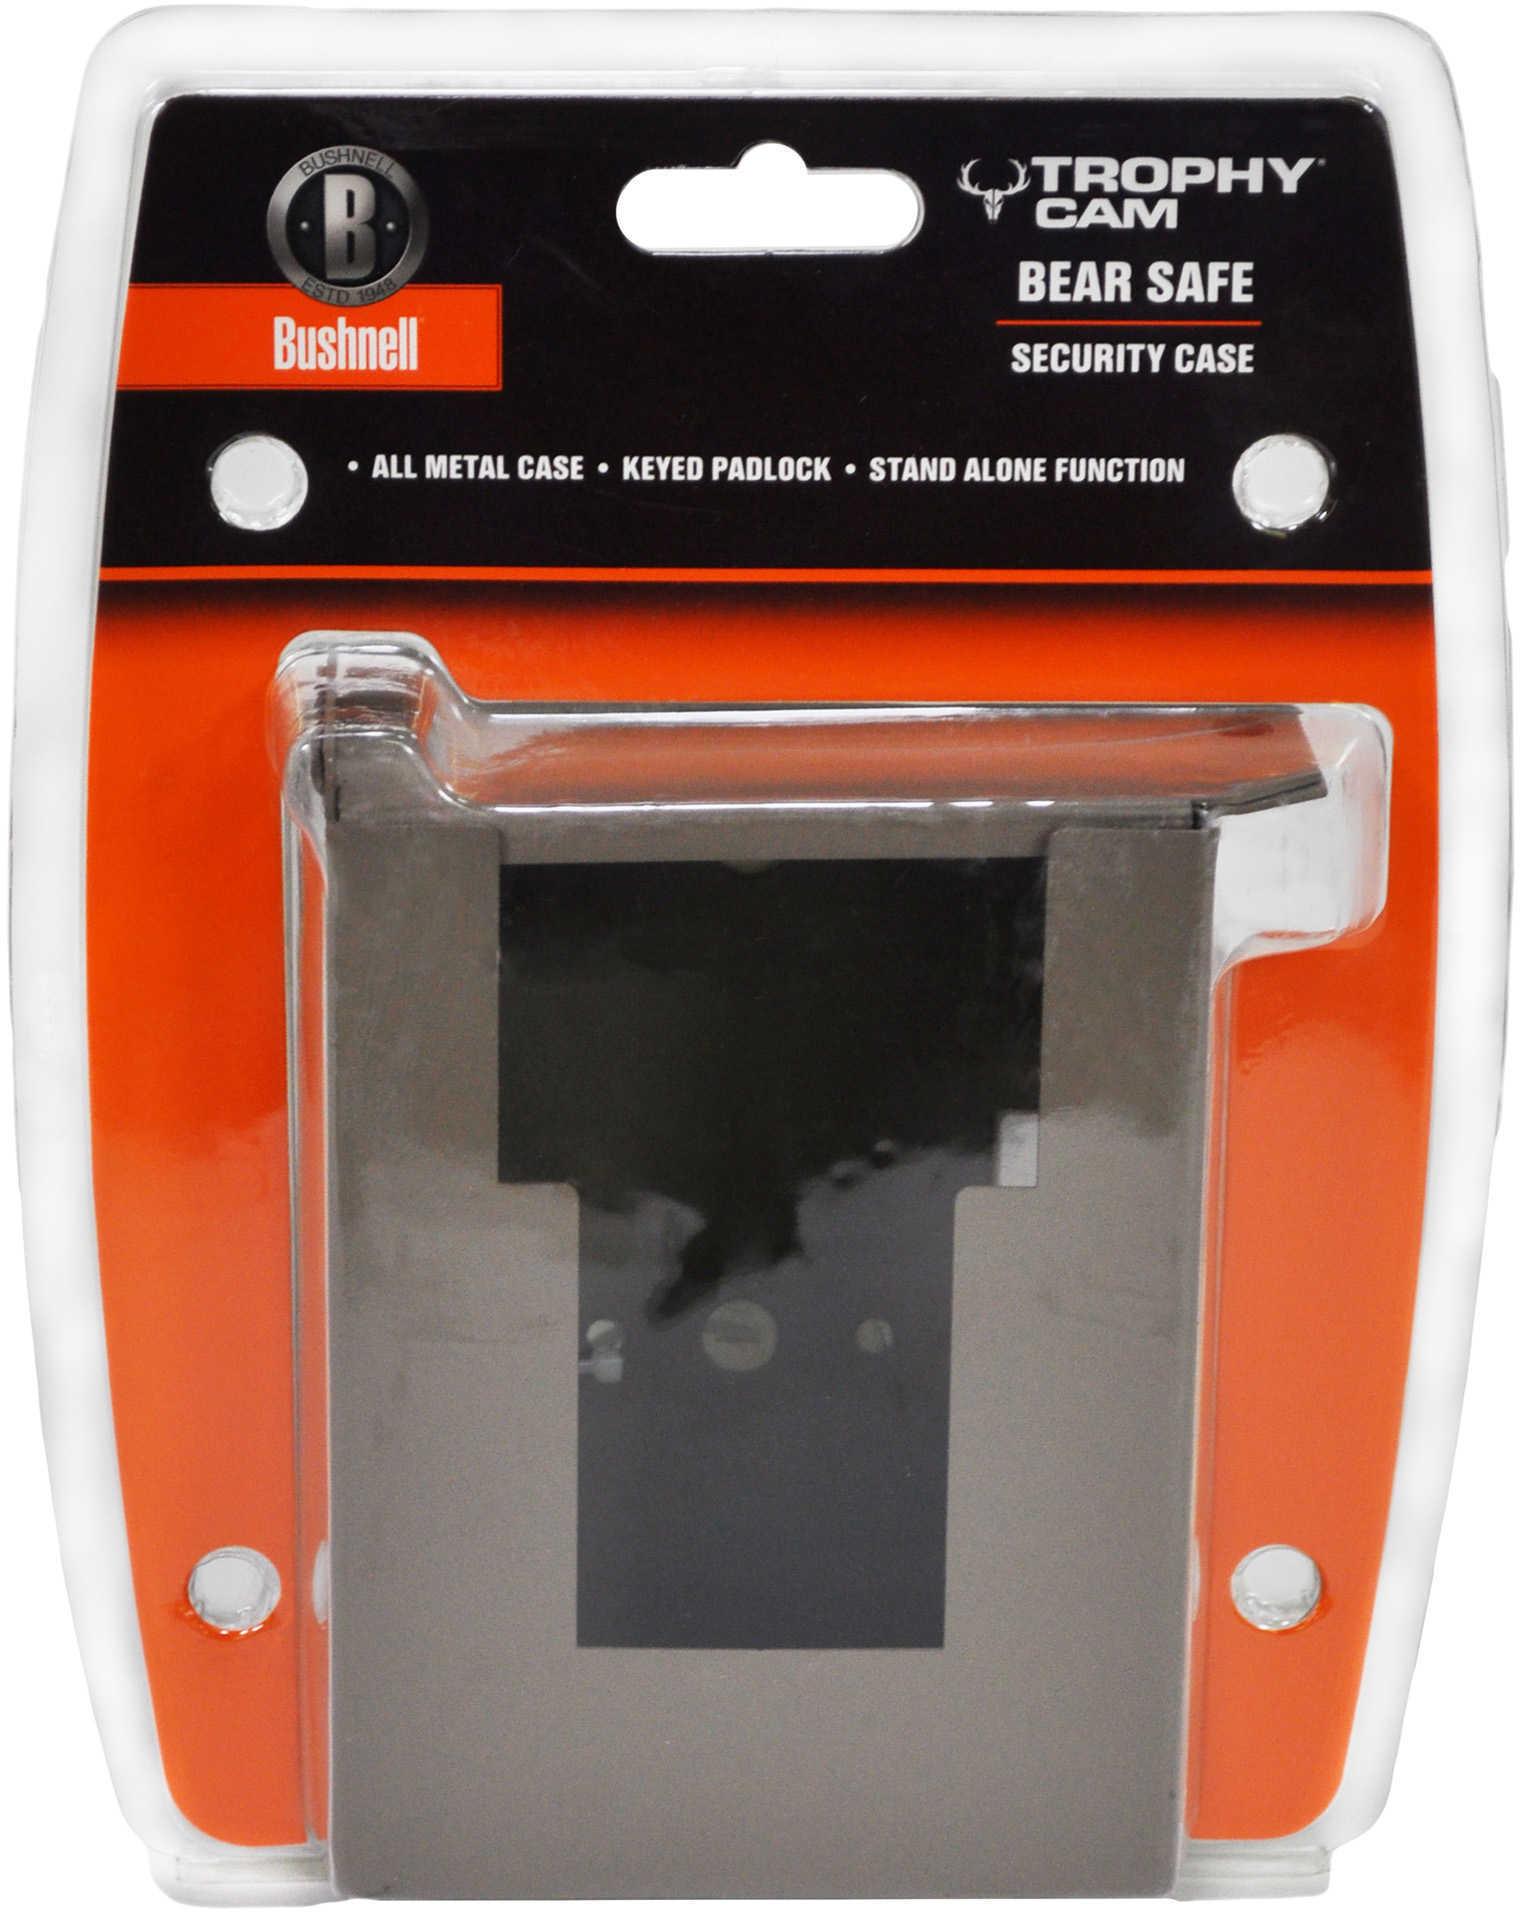 Bushnell Security Case Trophy Cam Brown 119653C